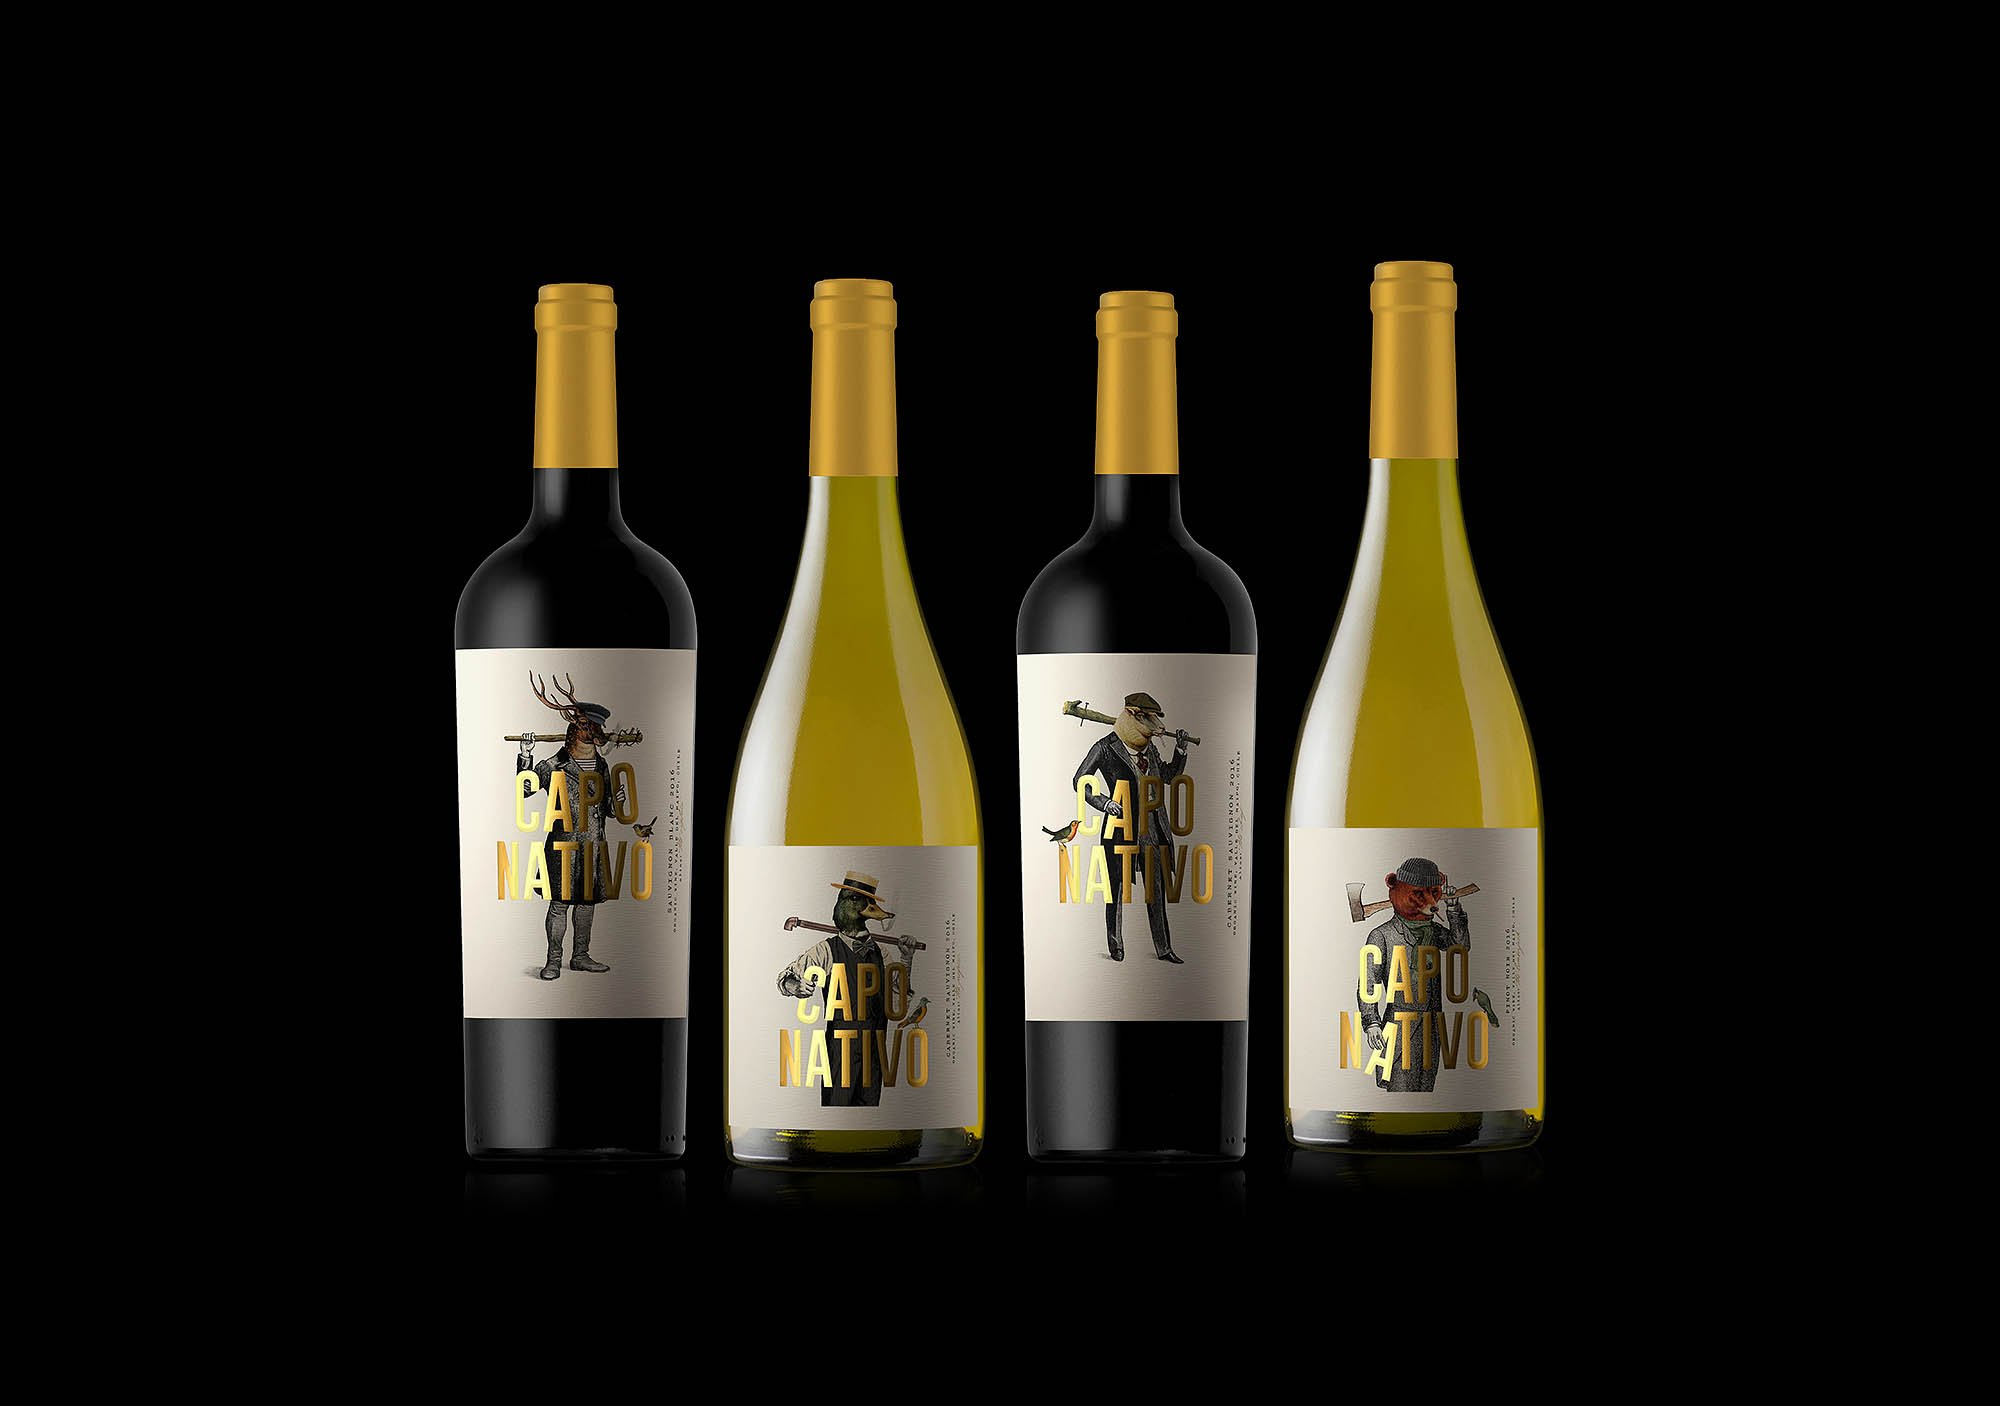 capo nativo wine chile vino oveja remi